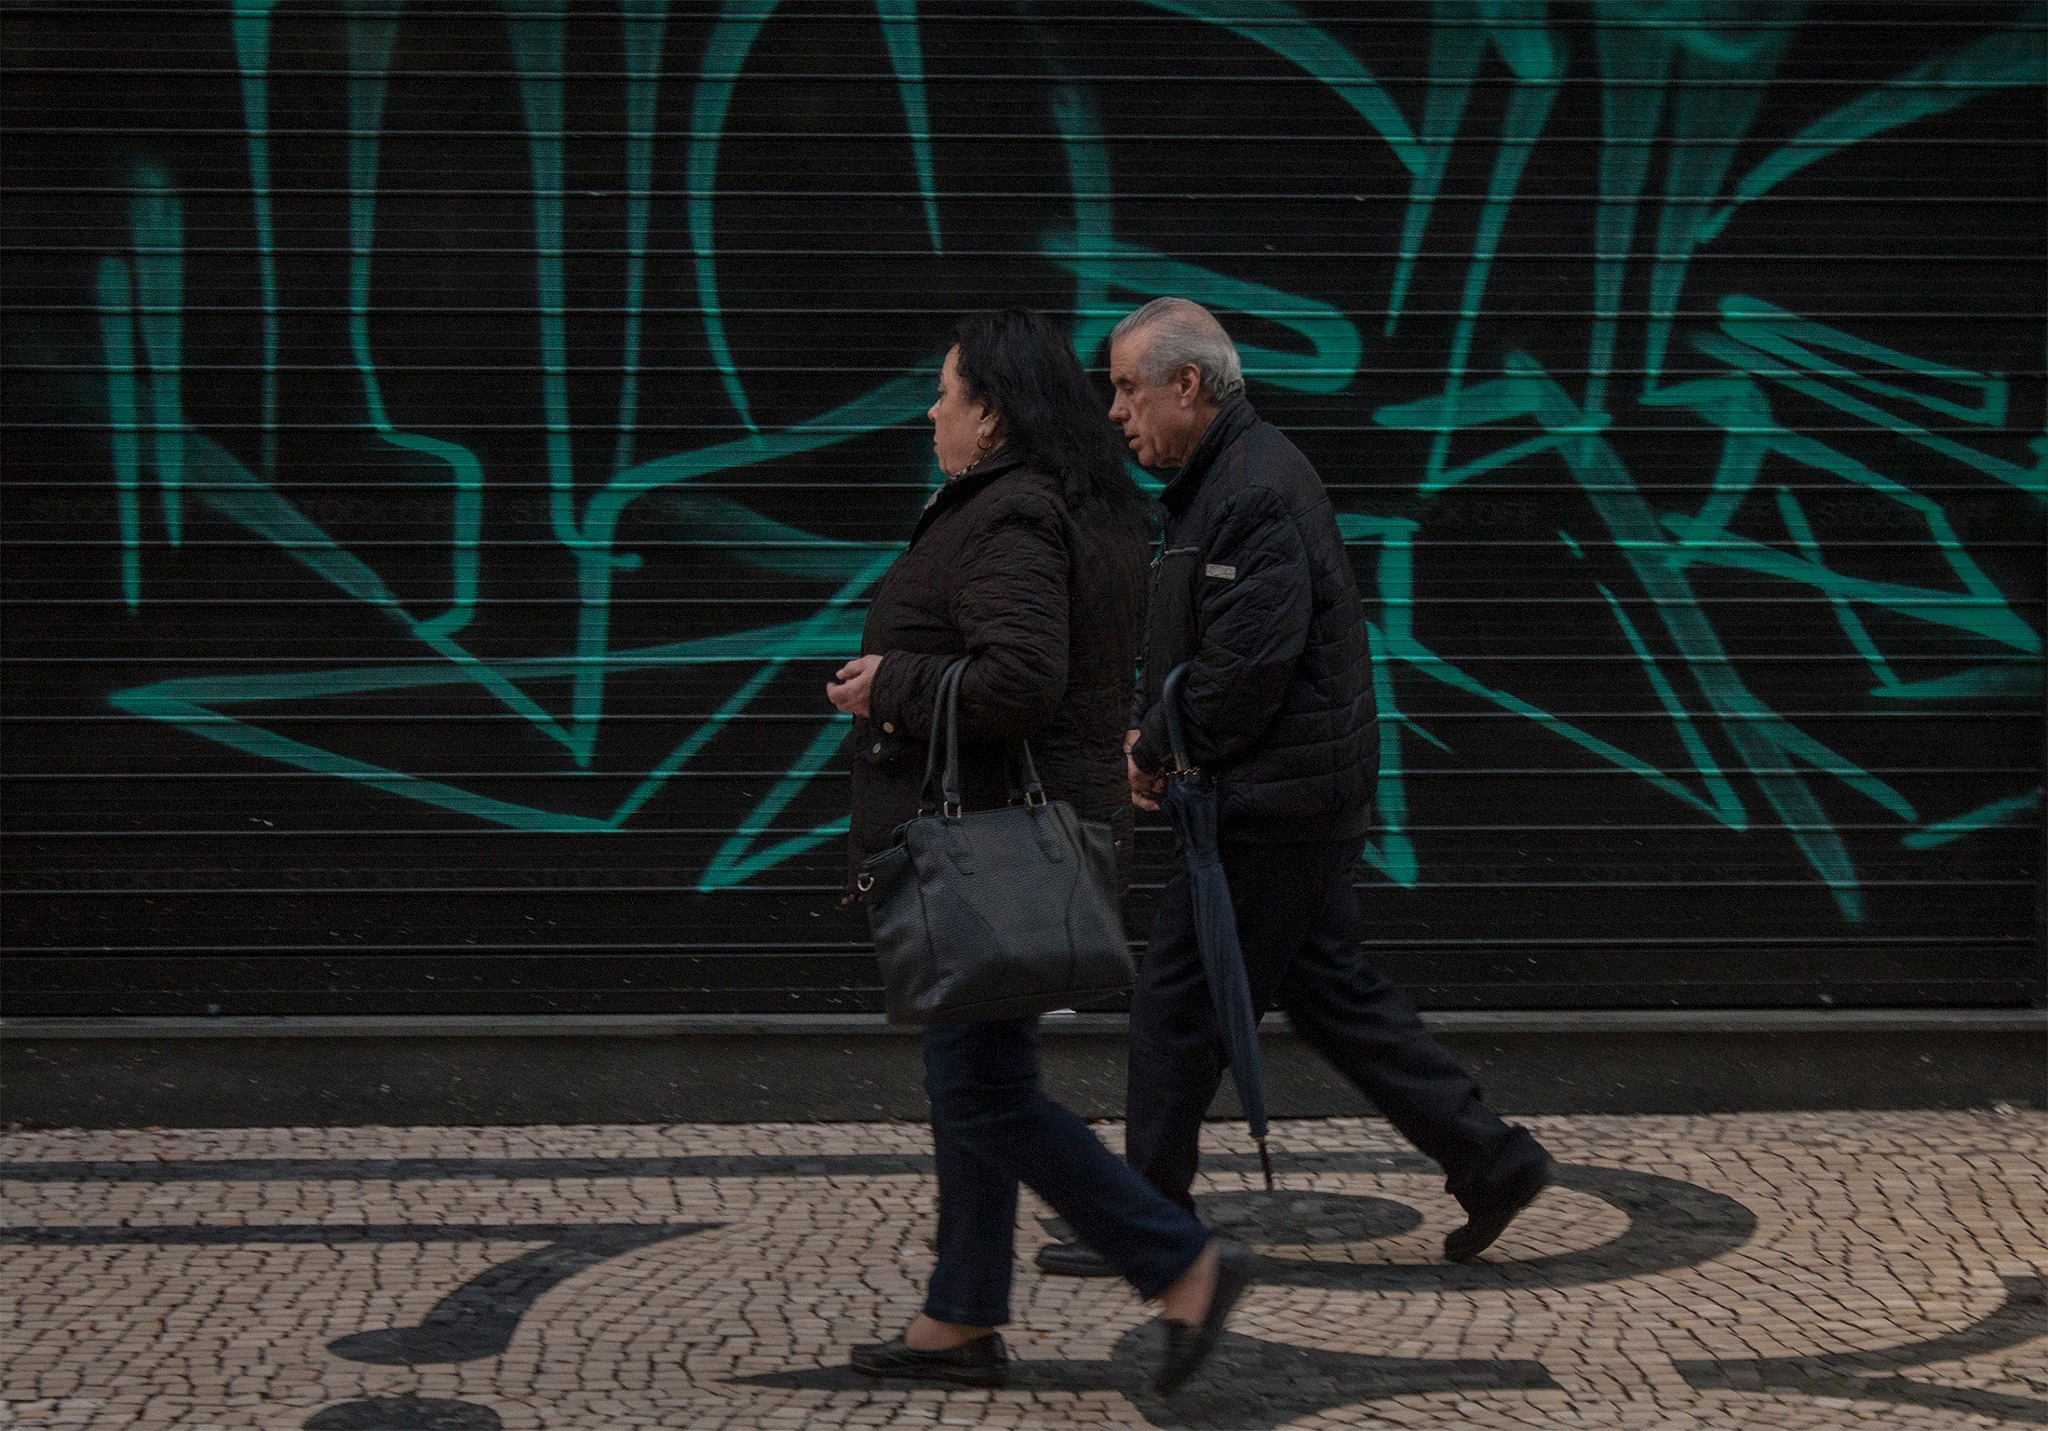 In the high street by David Machado